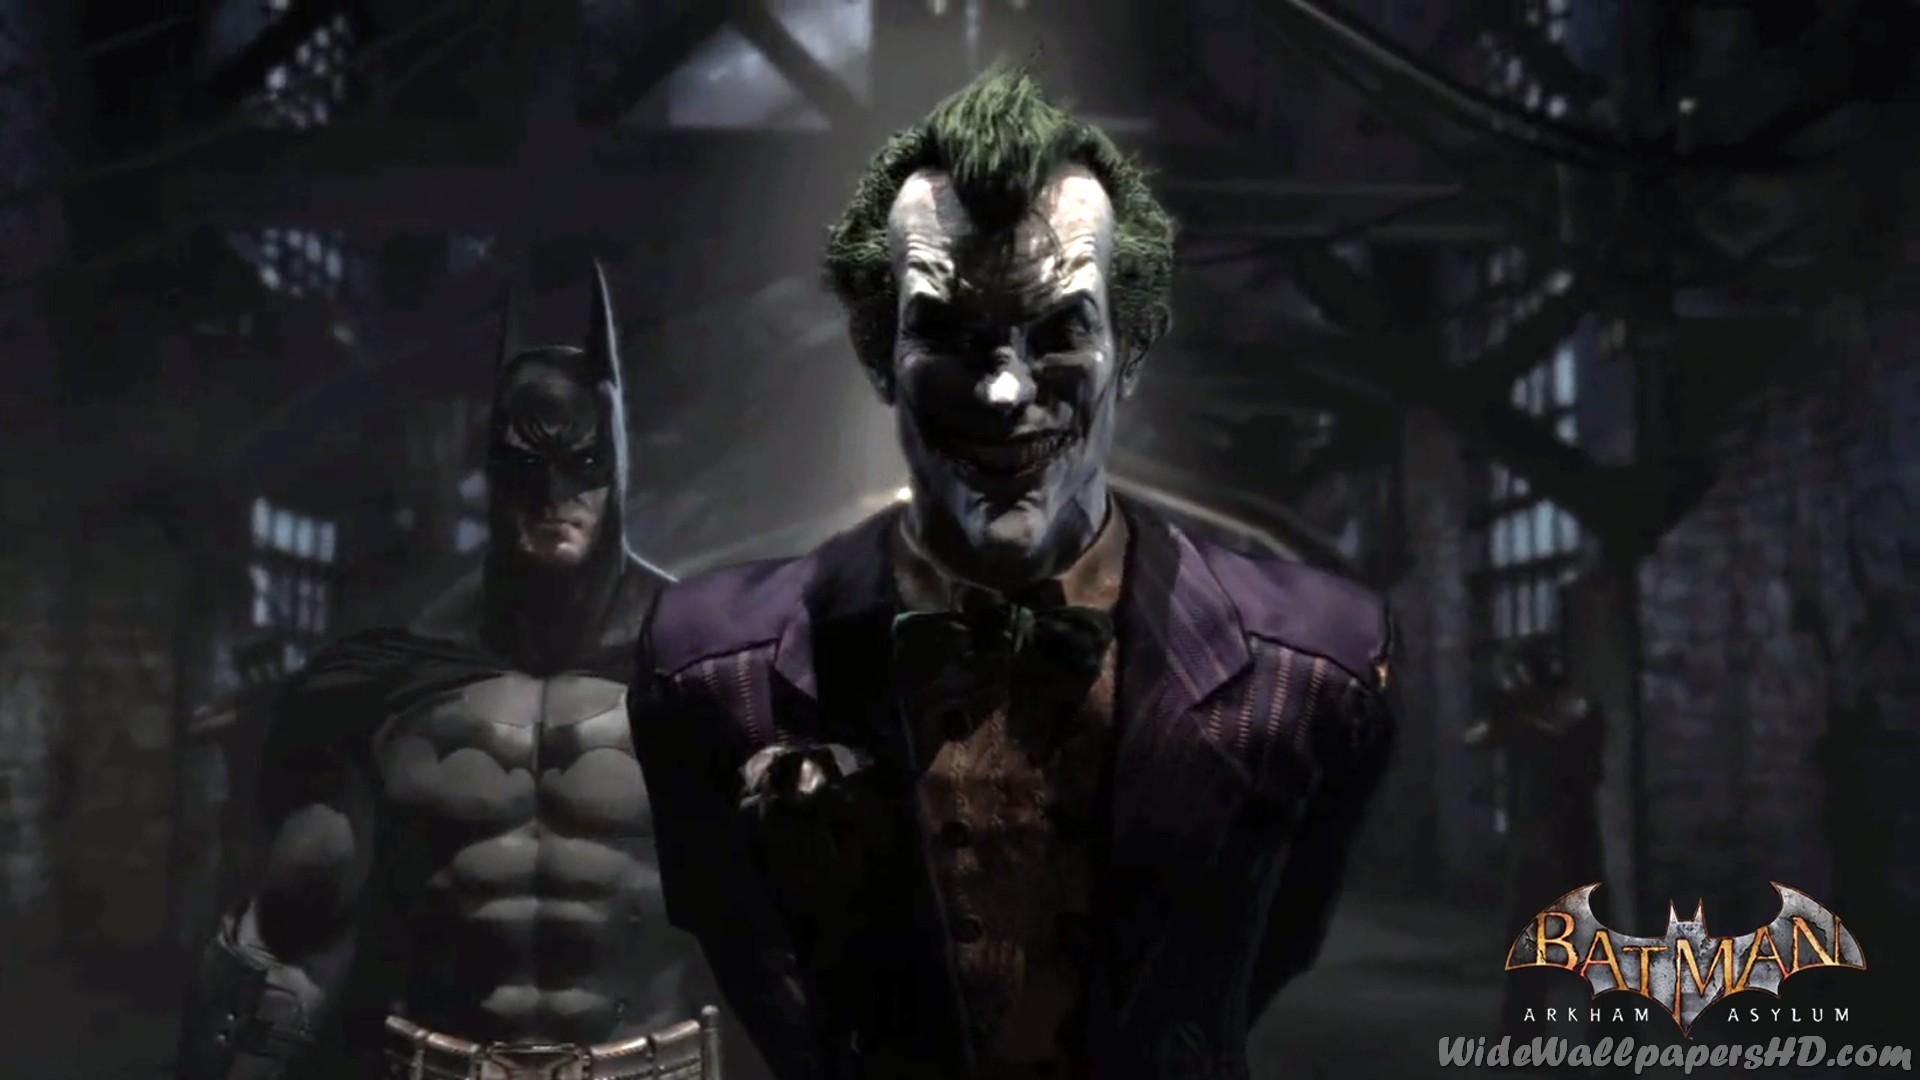 Joker Arkham Asylum Wallpaper Joker arkham a 1920x1080